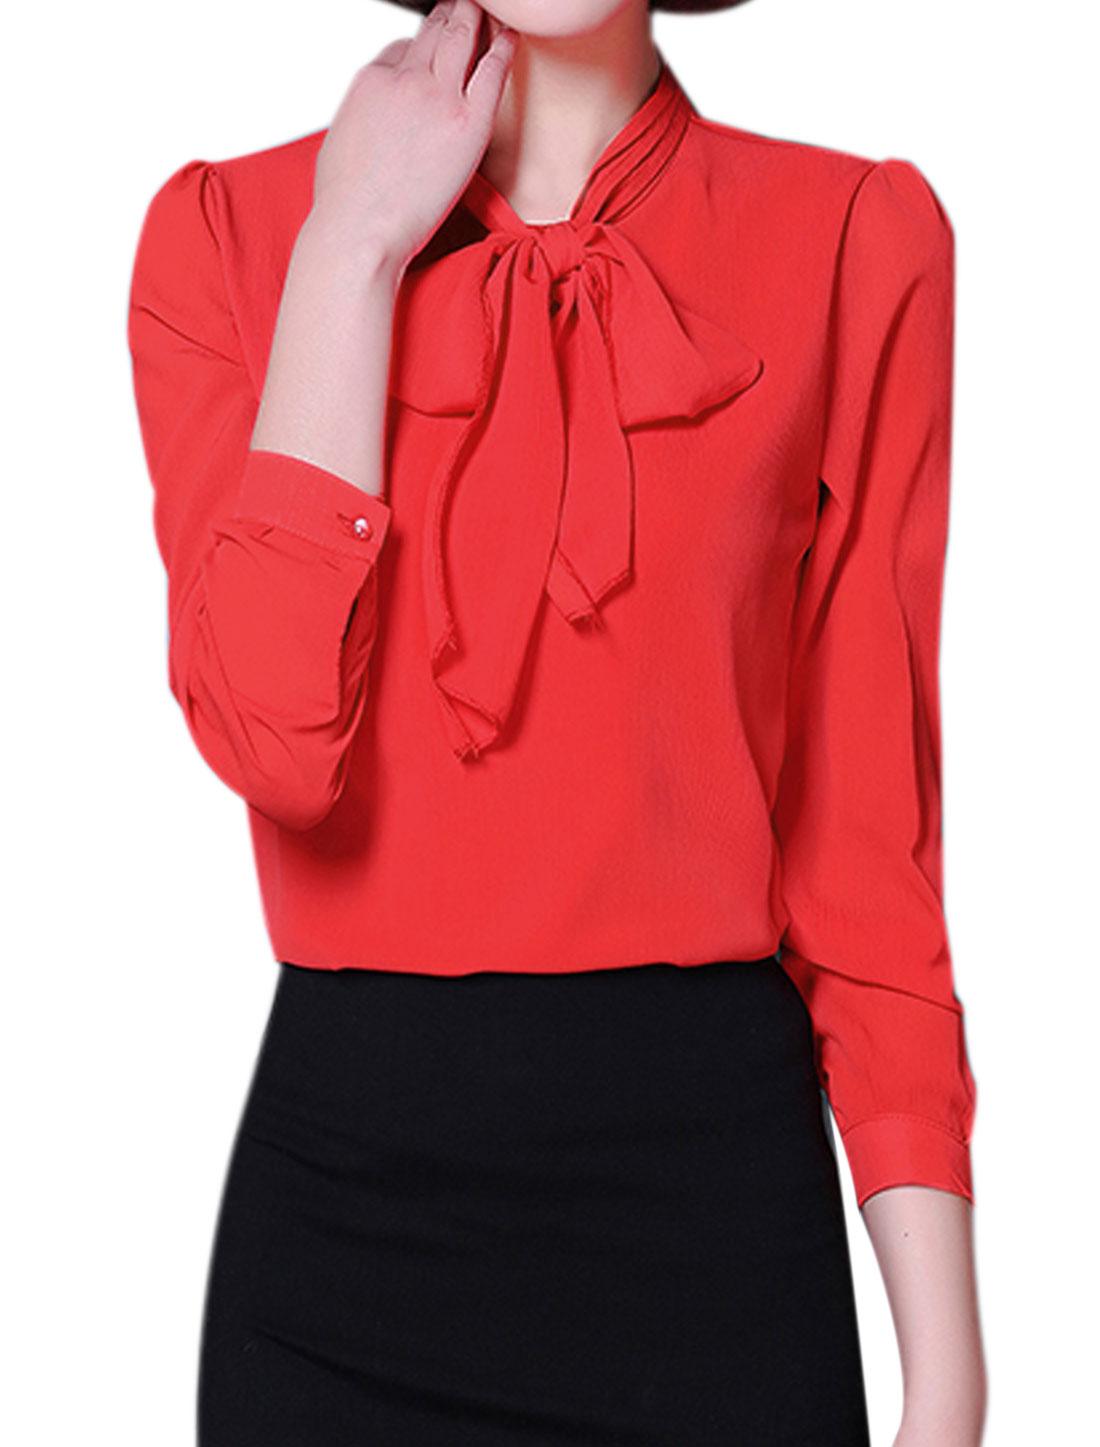 Ladies Tie-Bow Neck Long Sleeves Slim Fit Blouse Red M